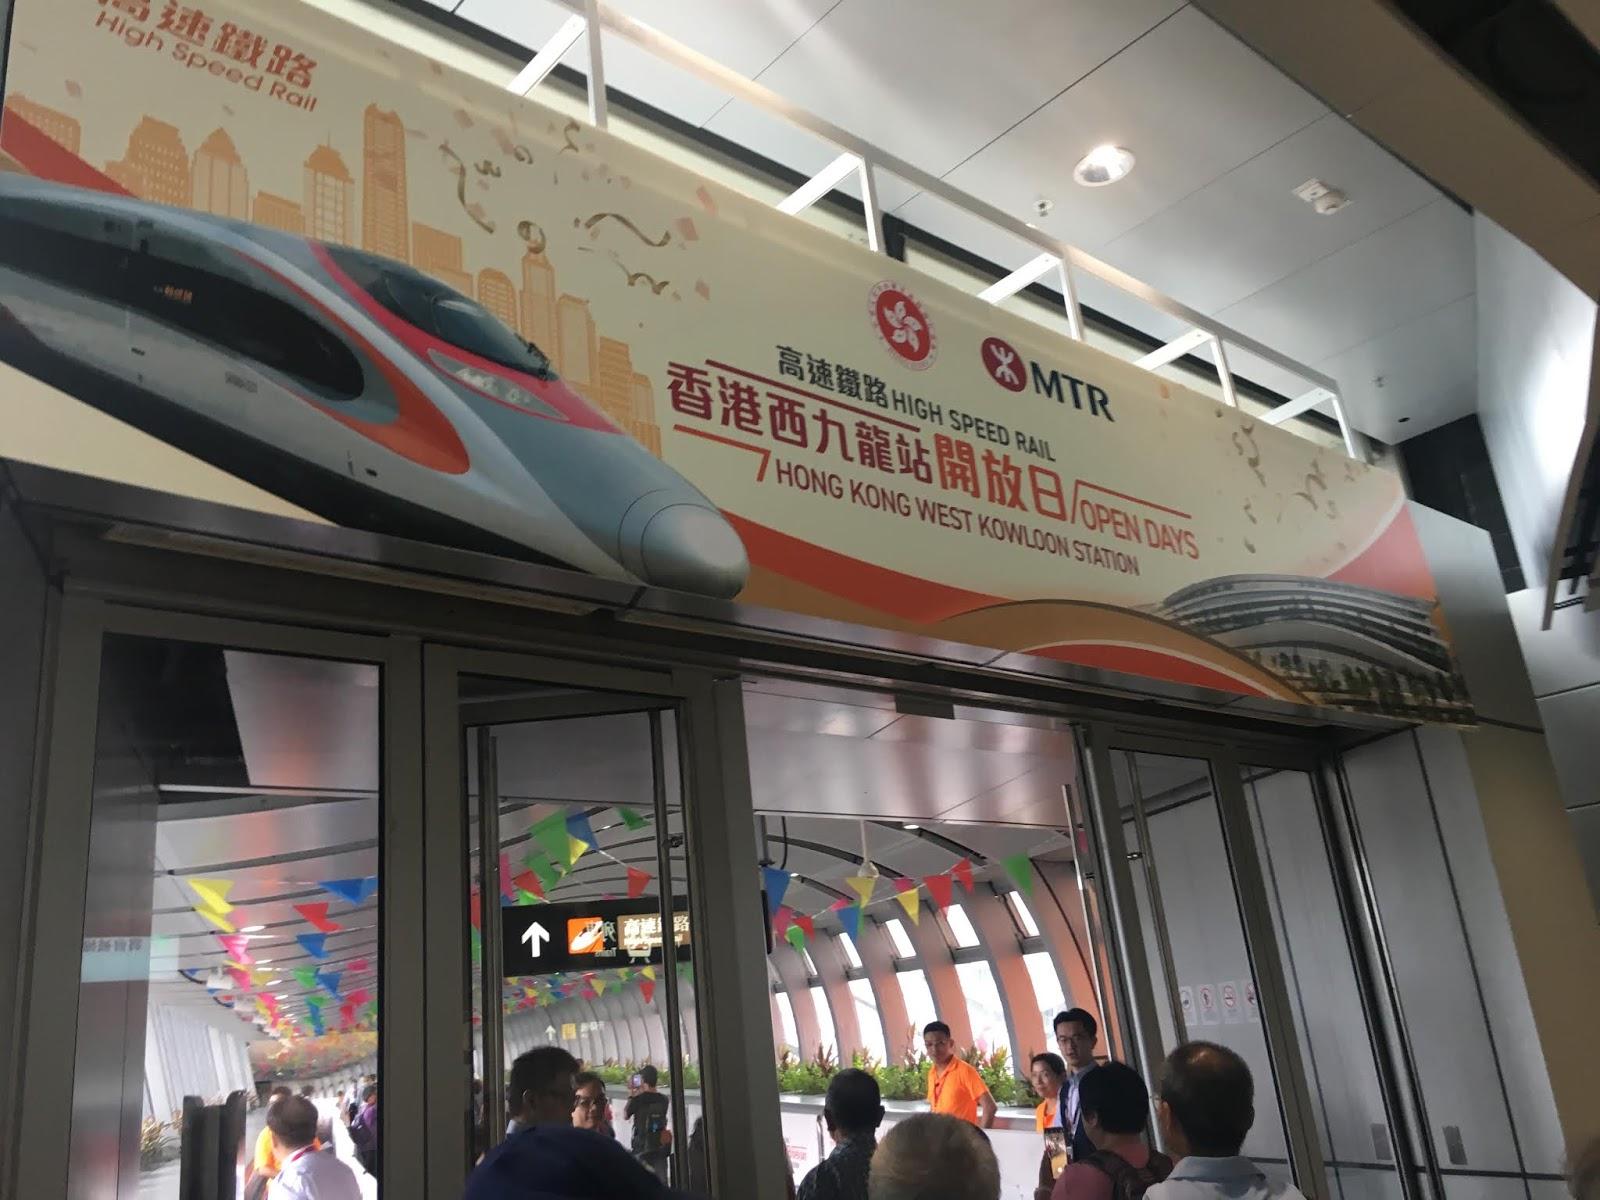 Soldier 的世界: 高鐵西九龍站開放日